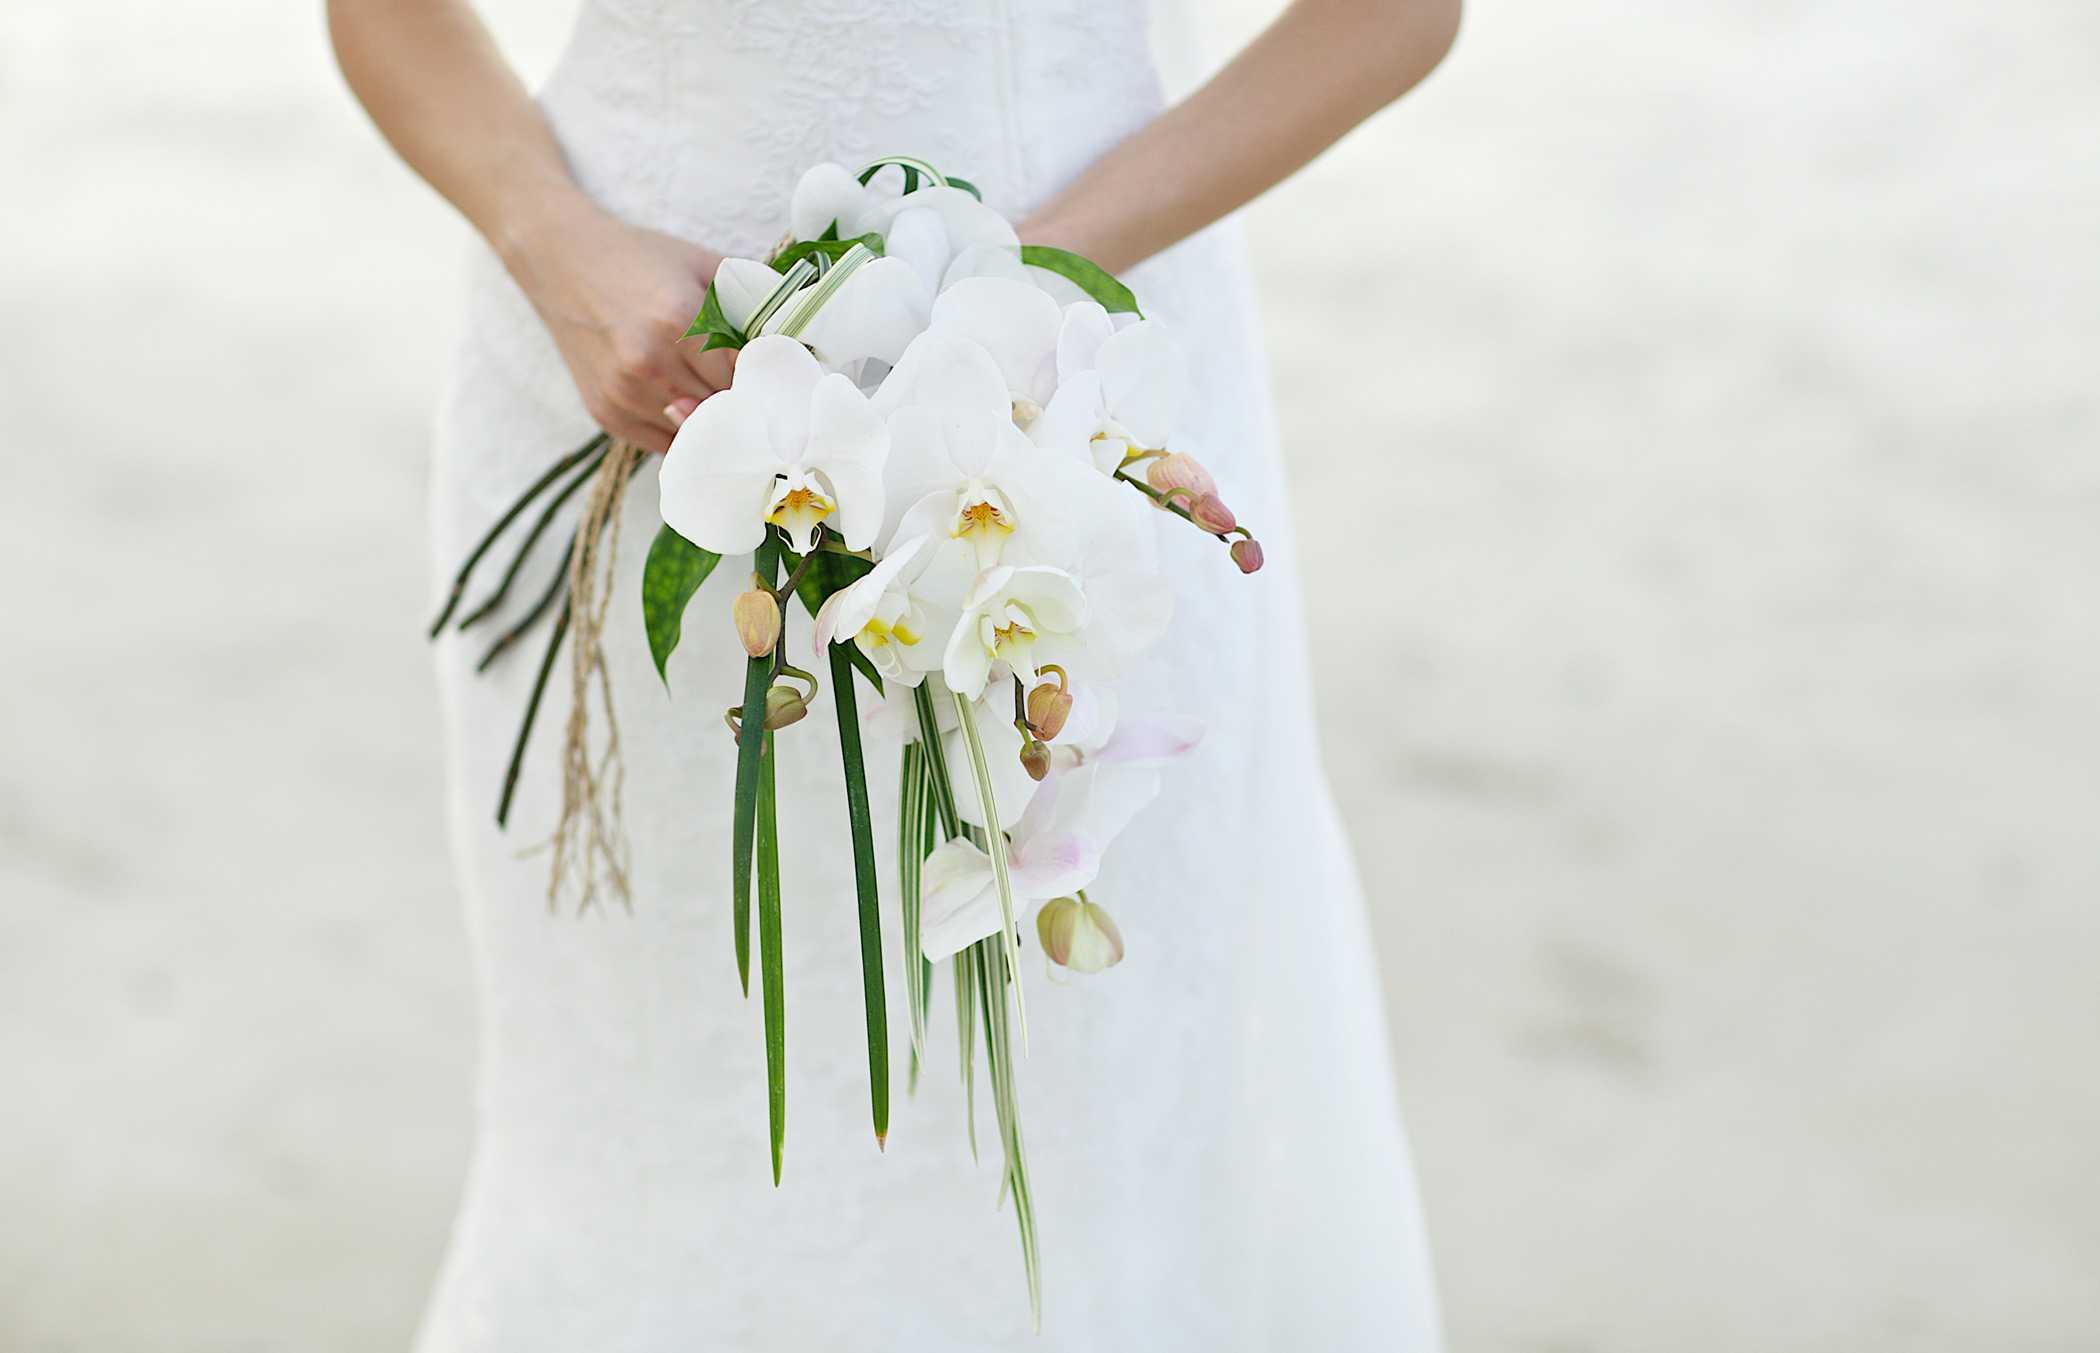 hilton-head-heavenly-spa-sc-wedding-treatment